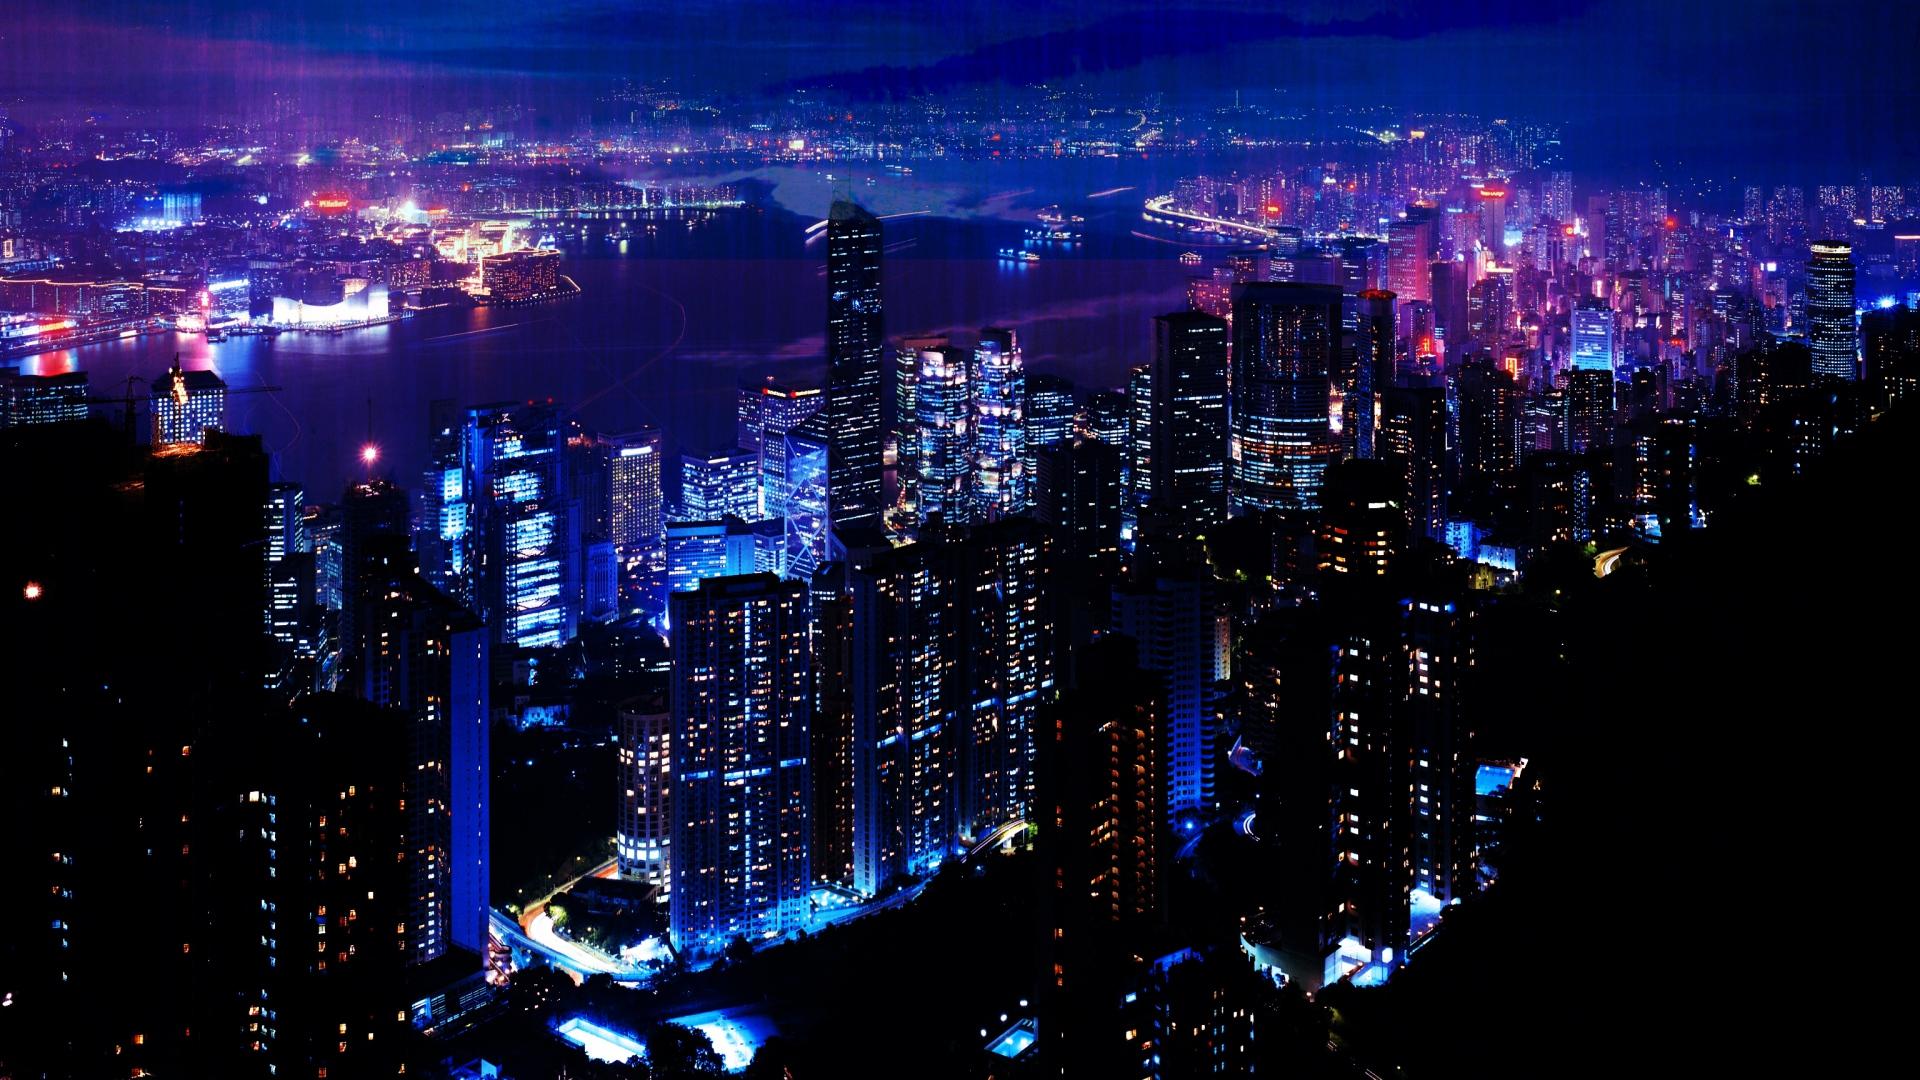 Full Hd 1080p City Wallpapers Desktop Backgrounds Hd Downloads